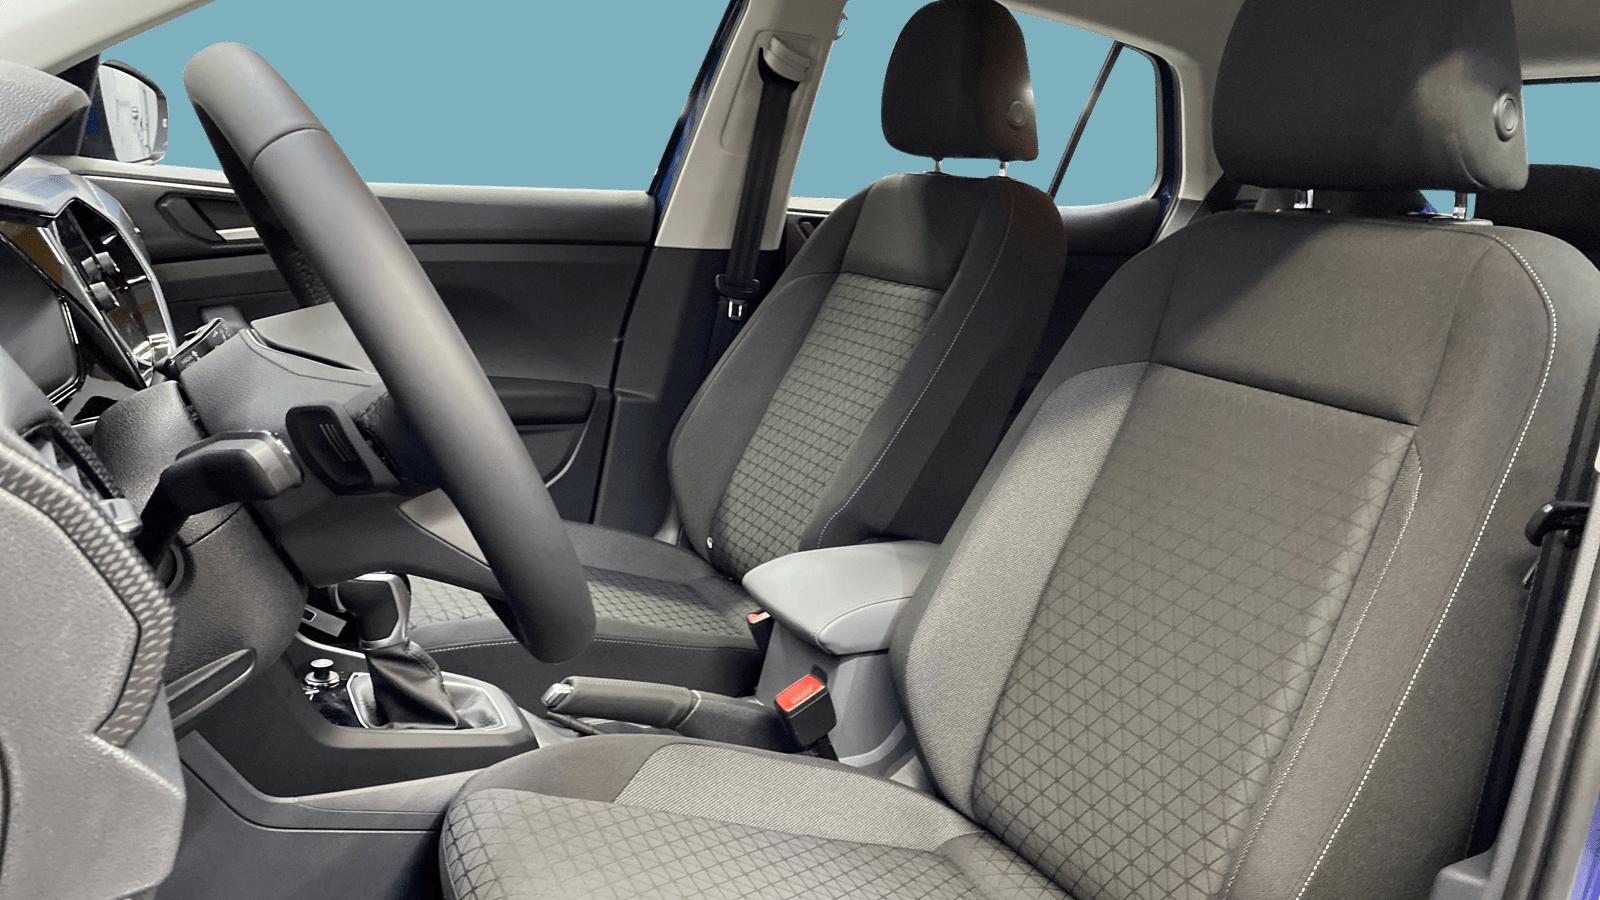 VW T-Cross Blau interior - Clyde Auto-Abo